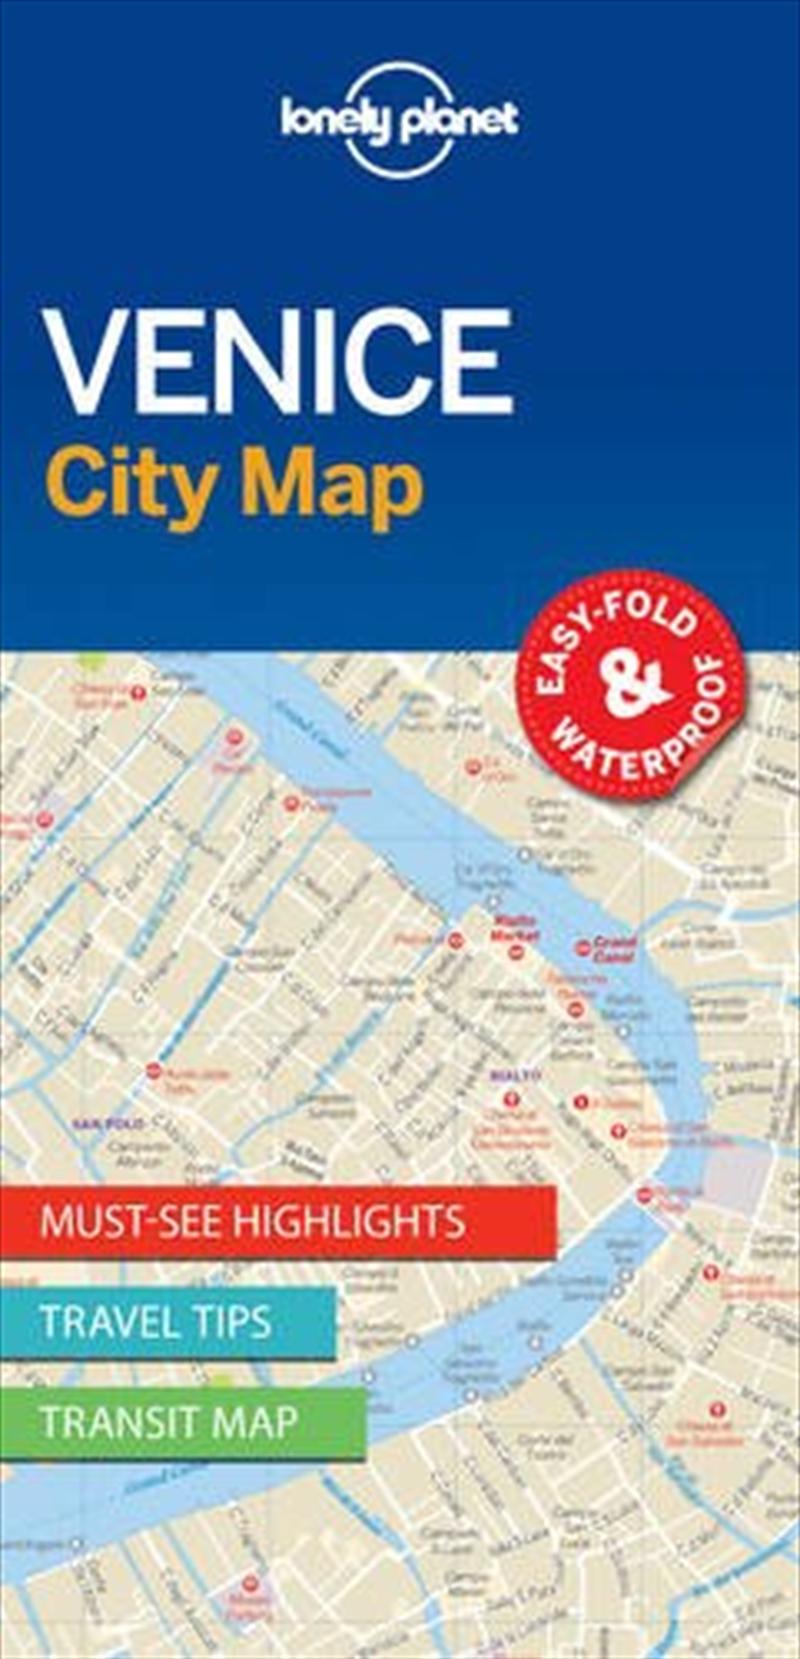 Venice City Map: Edition 1 | Sheet Map